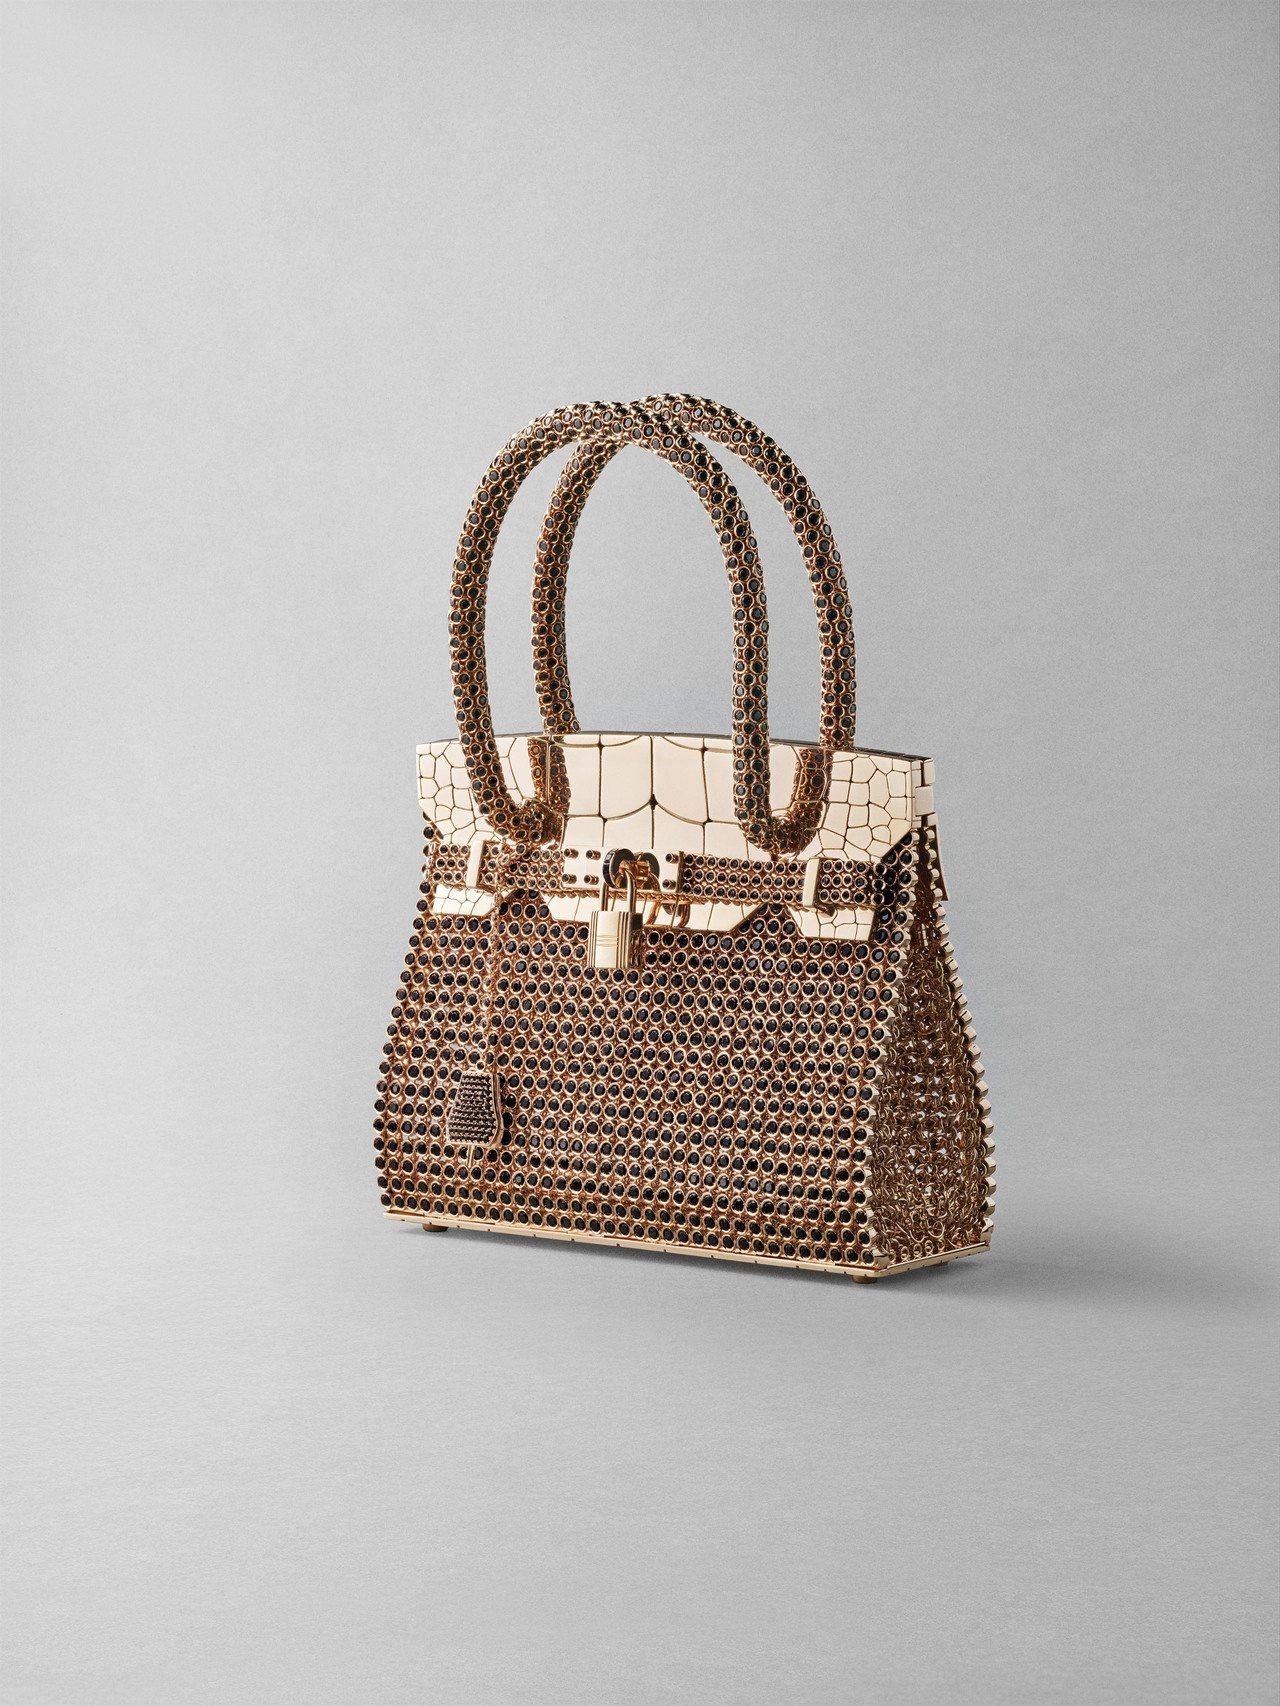 Birkin 系列玫瑰金鑲黑尖晶珠寶包,3,852萬900元。圖/愛馬仕提供